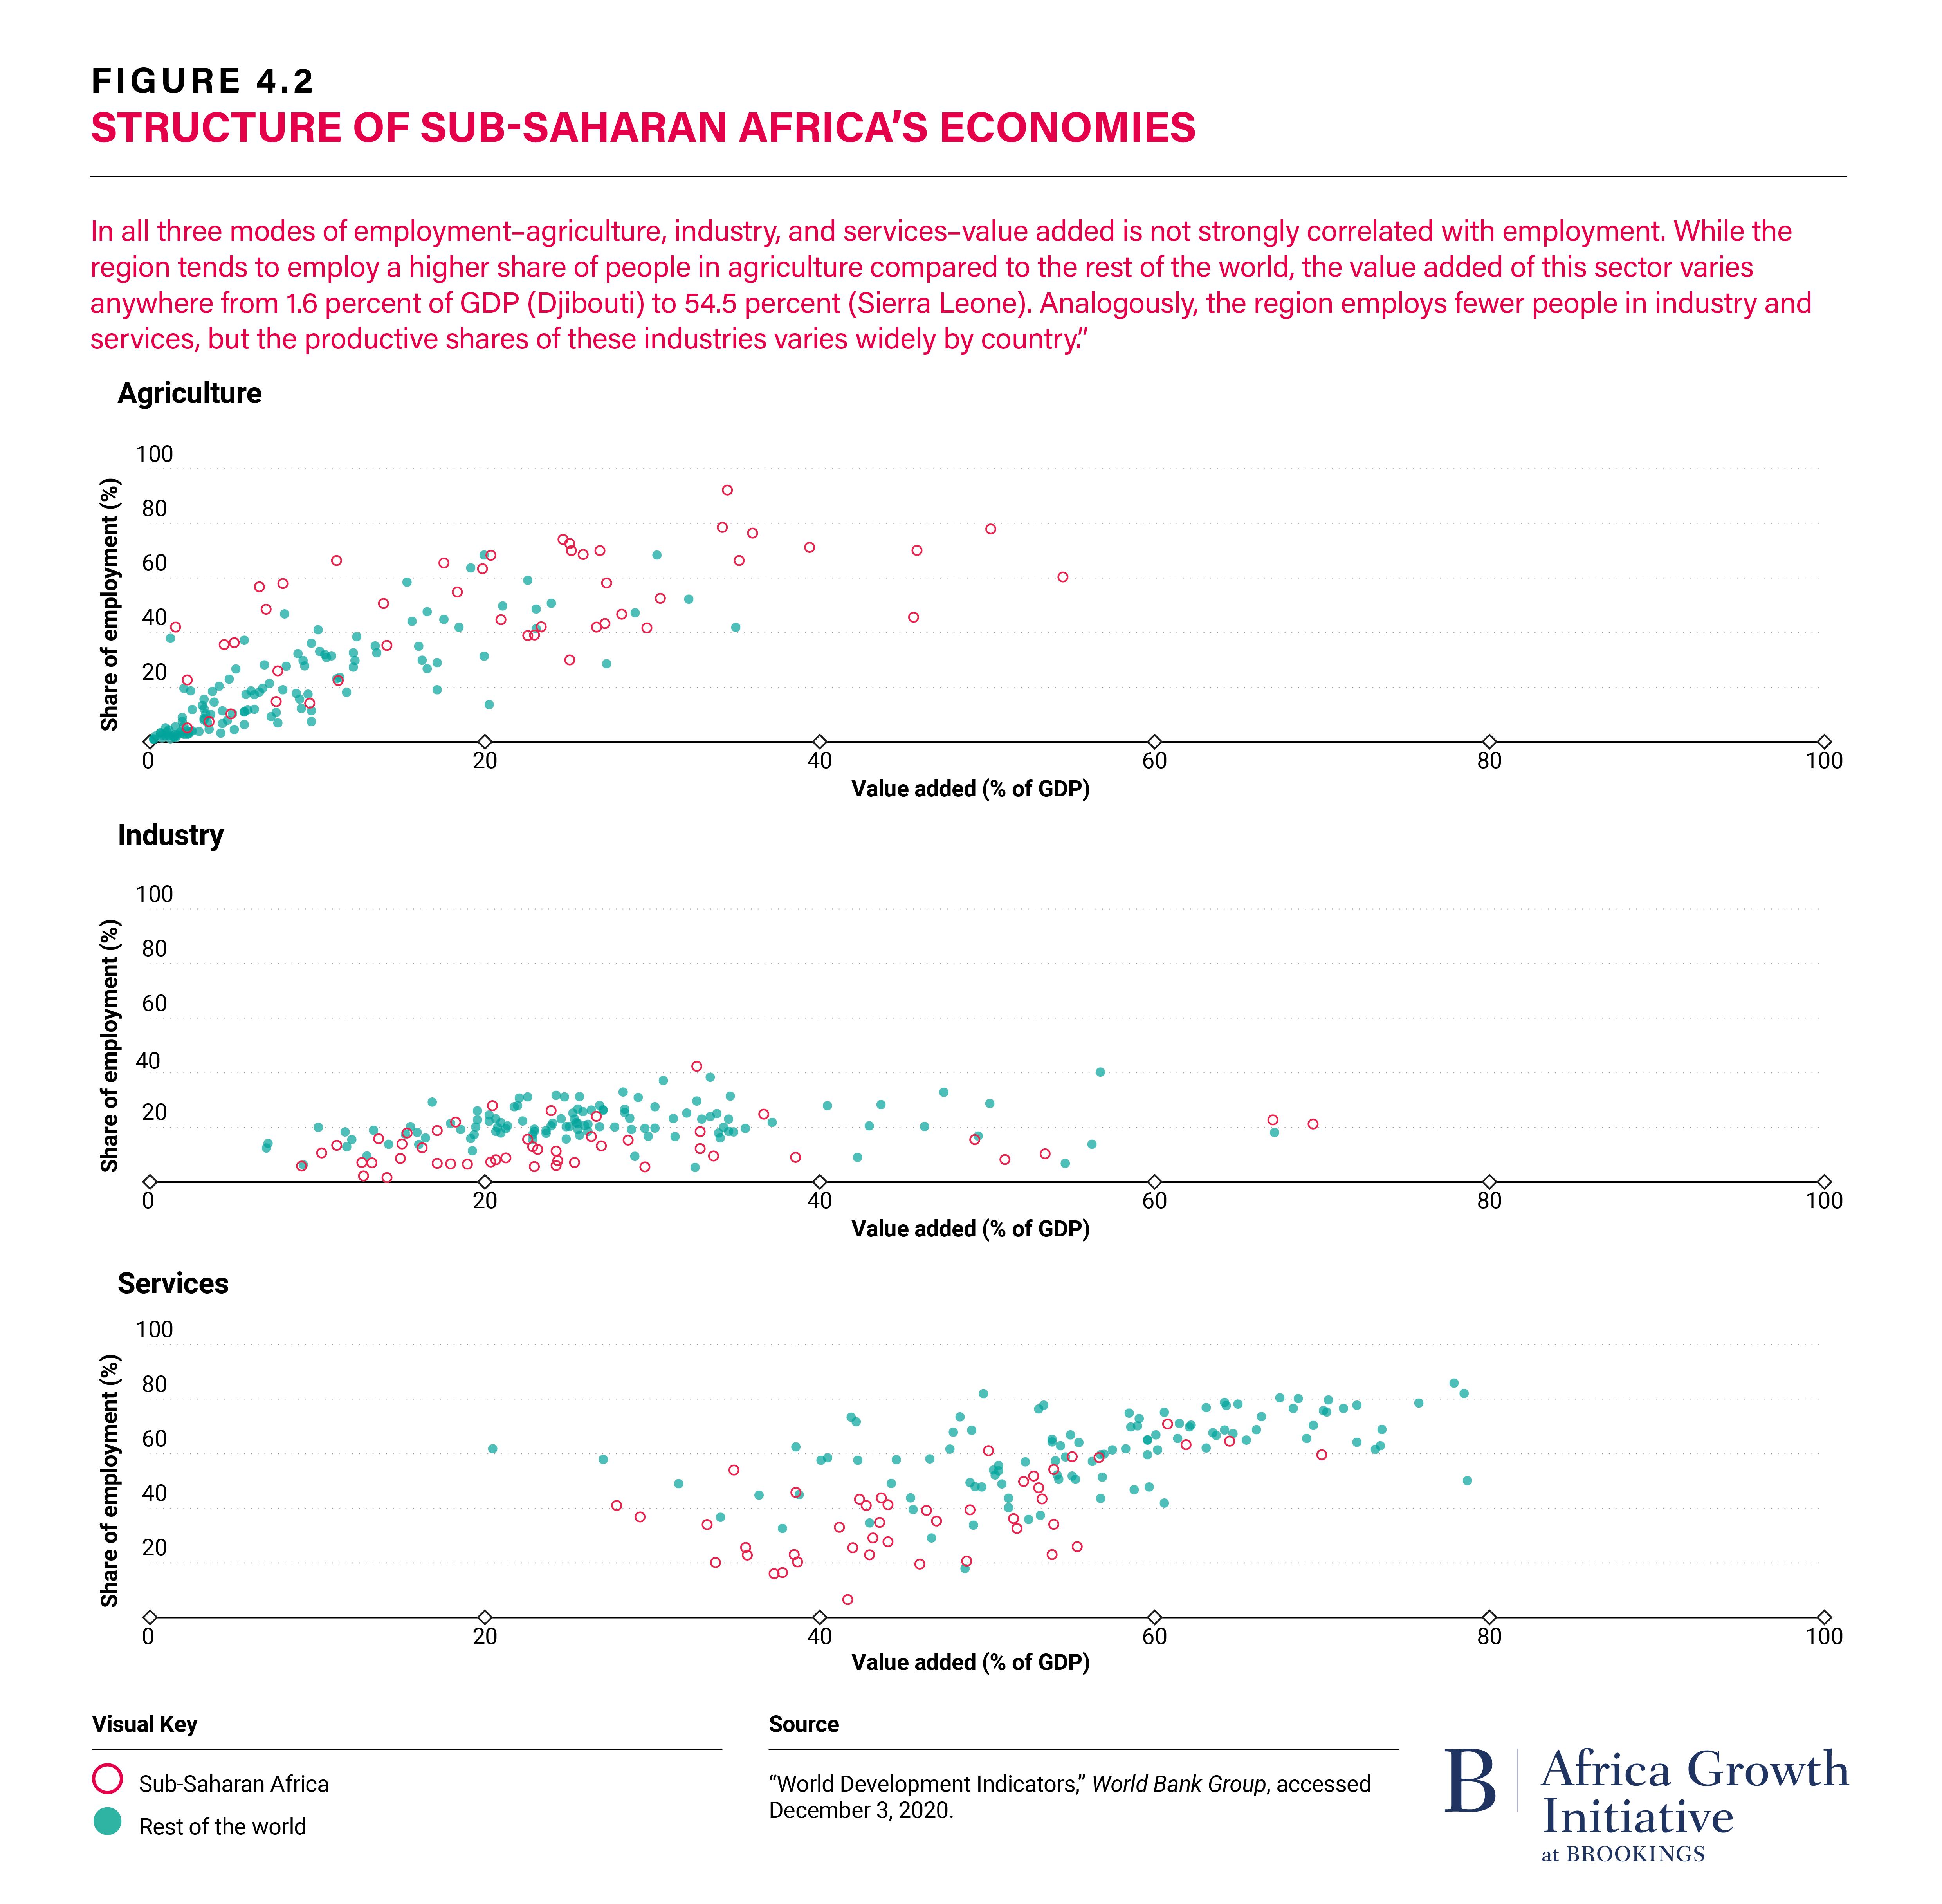 Figure 4.2 Structure of Sub-Saharan Africa's Economies